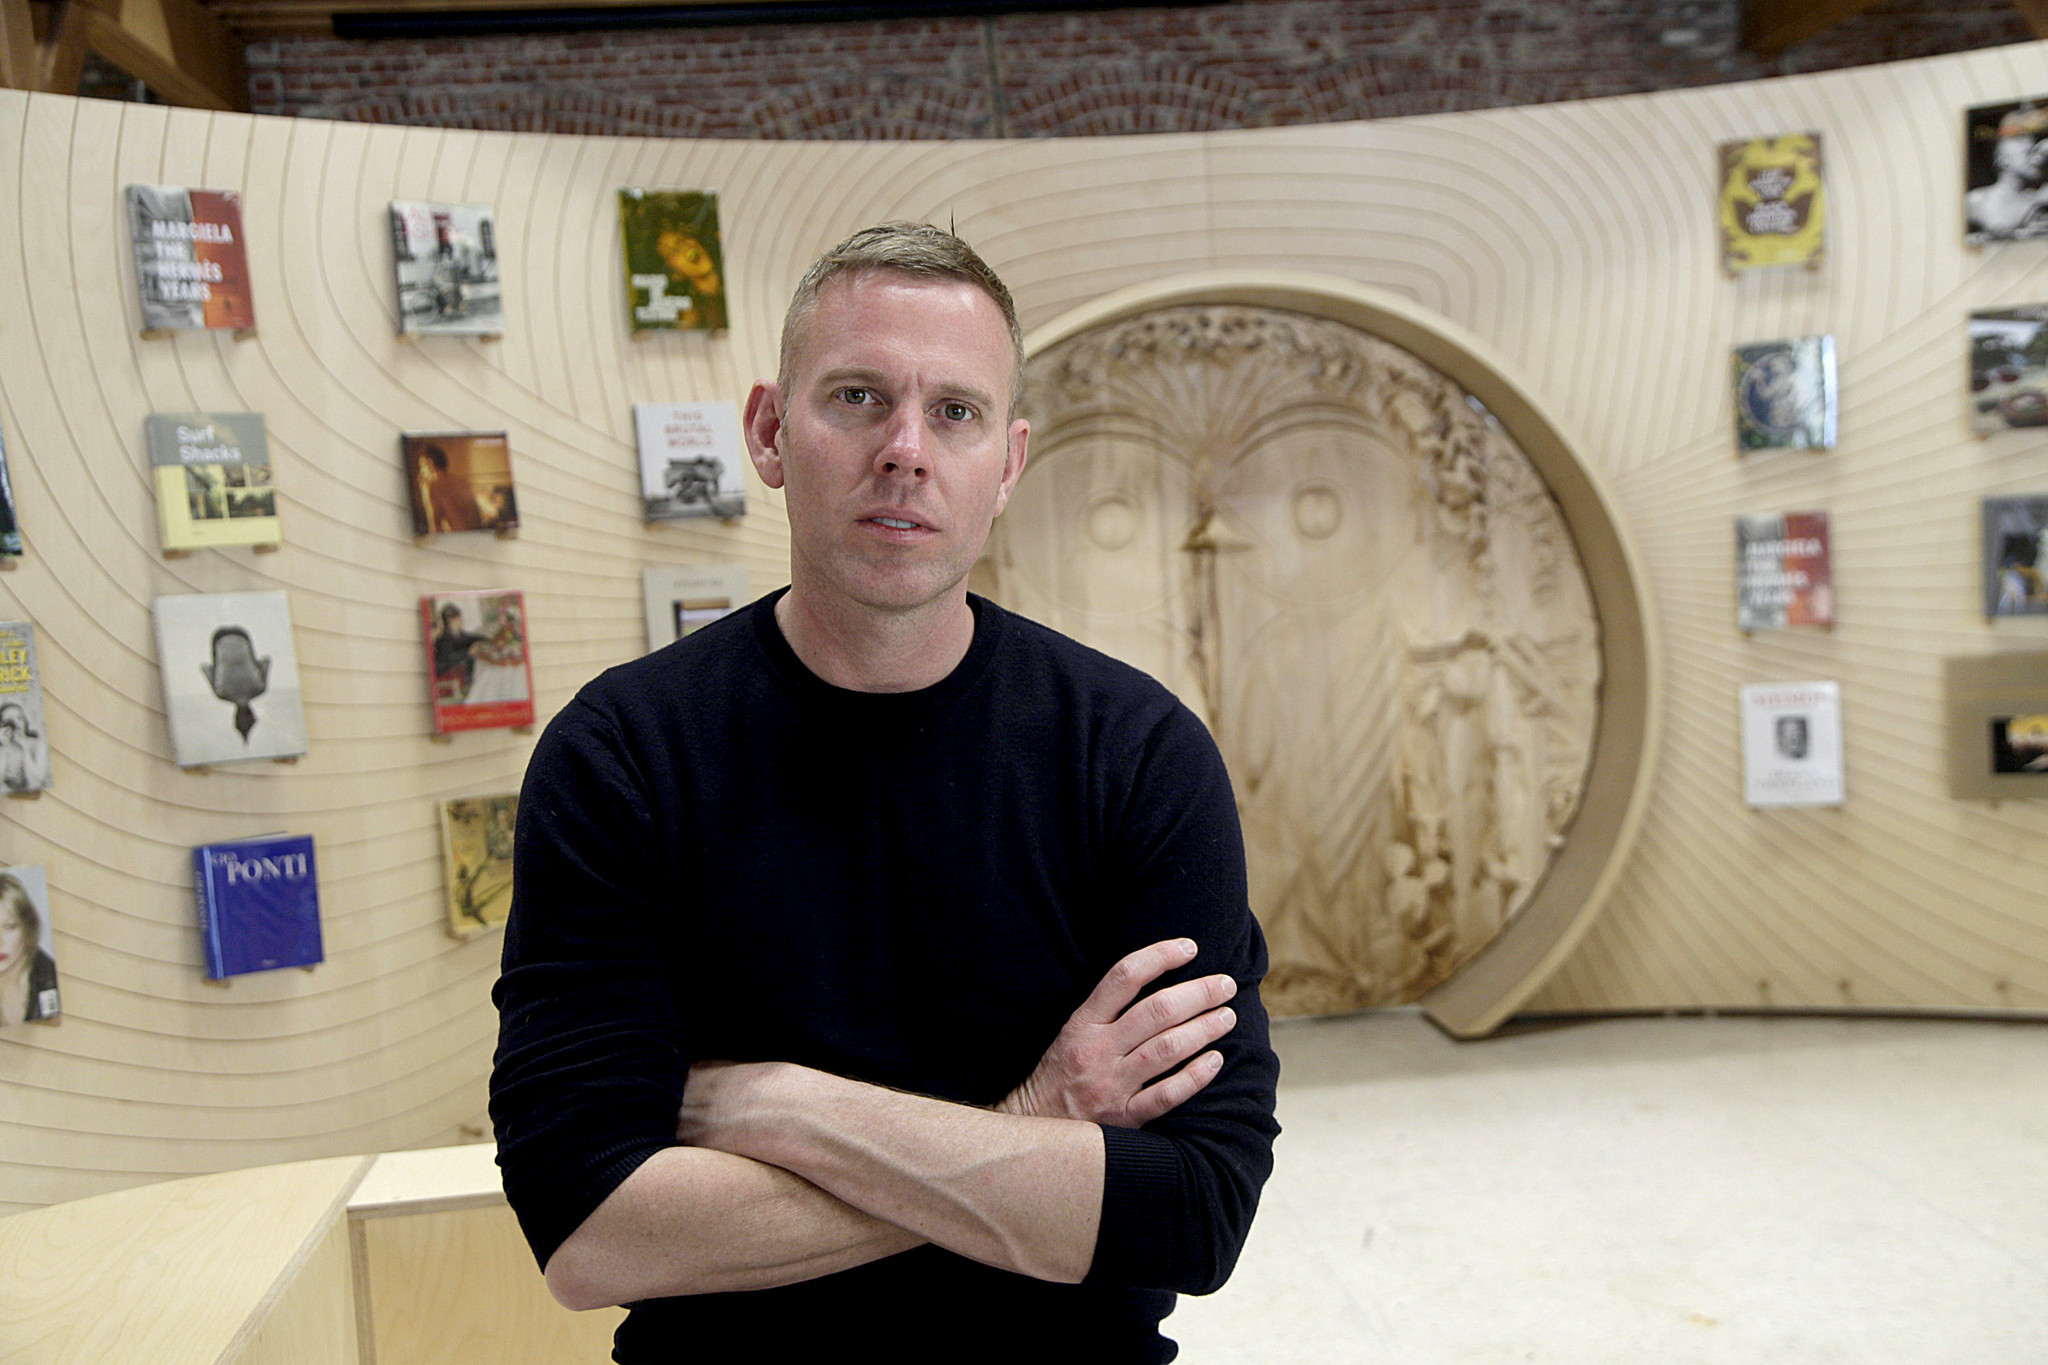 The Owl Bureau, a new Highland Park bookshop, builds on creating community